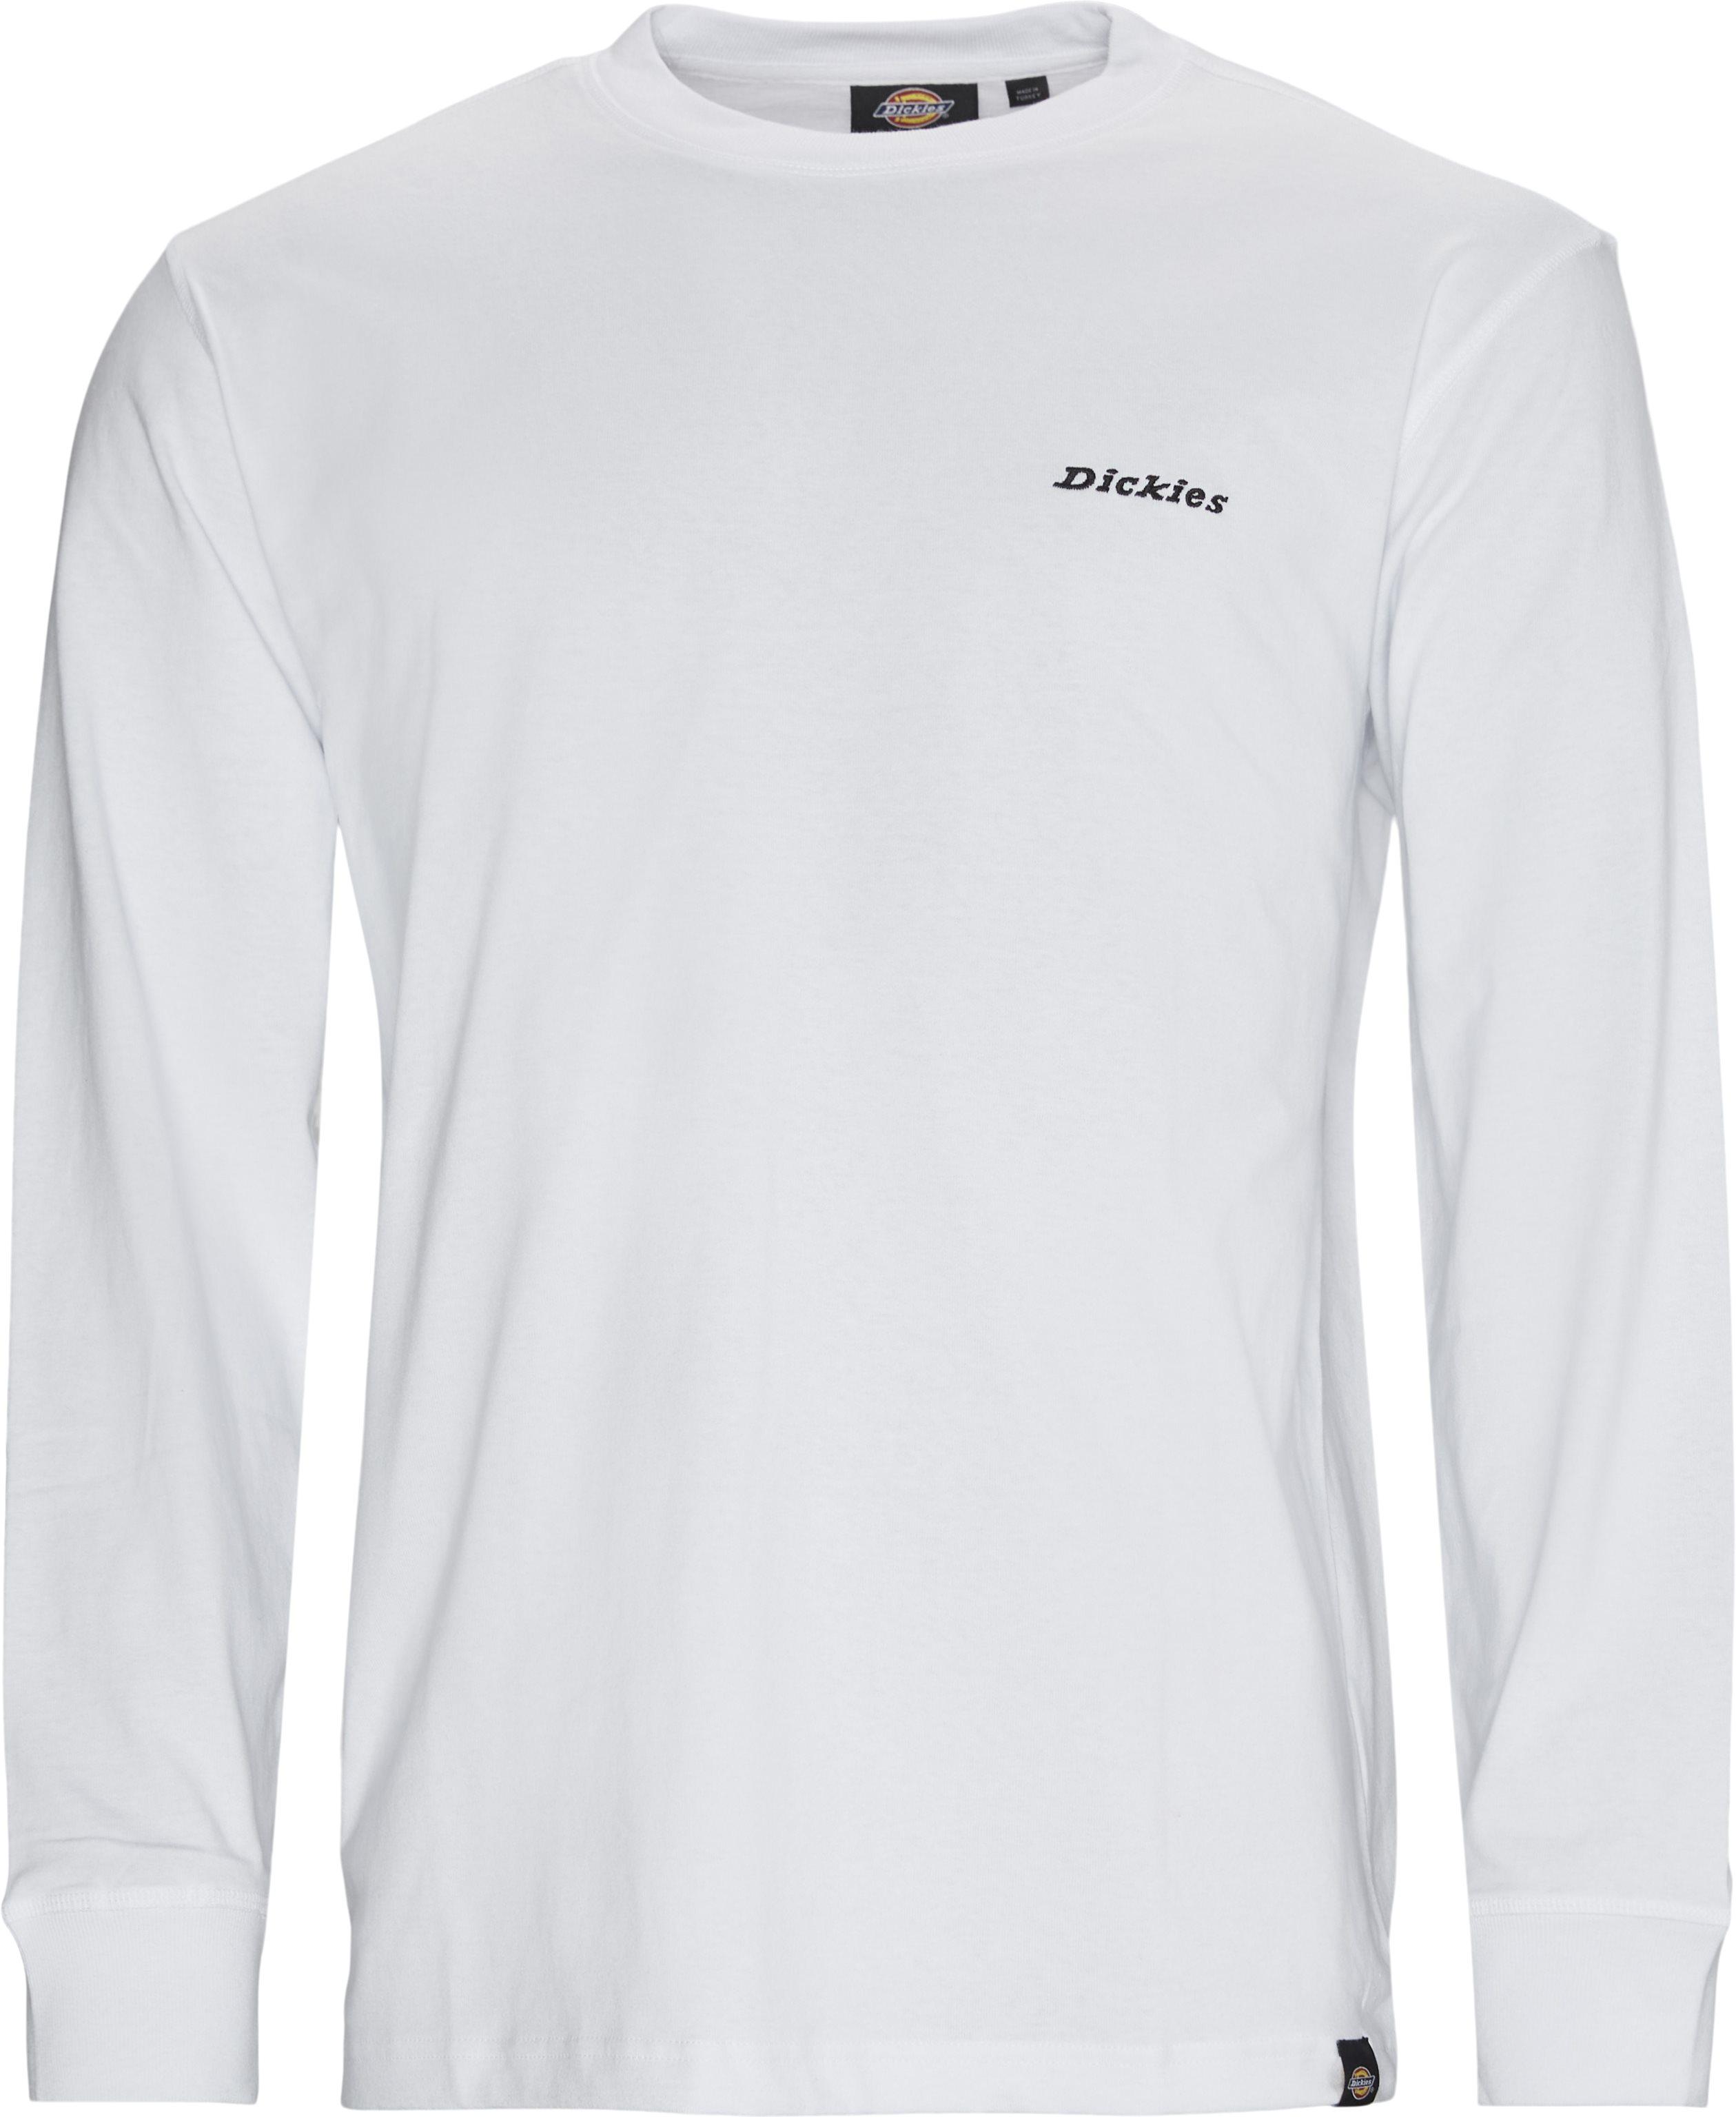 LS Loretto Langærmet T-shirt - T-shirts - Regular fit - Hvid